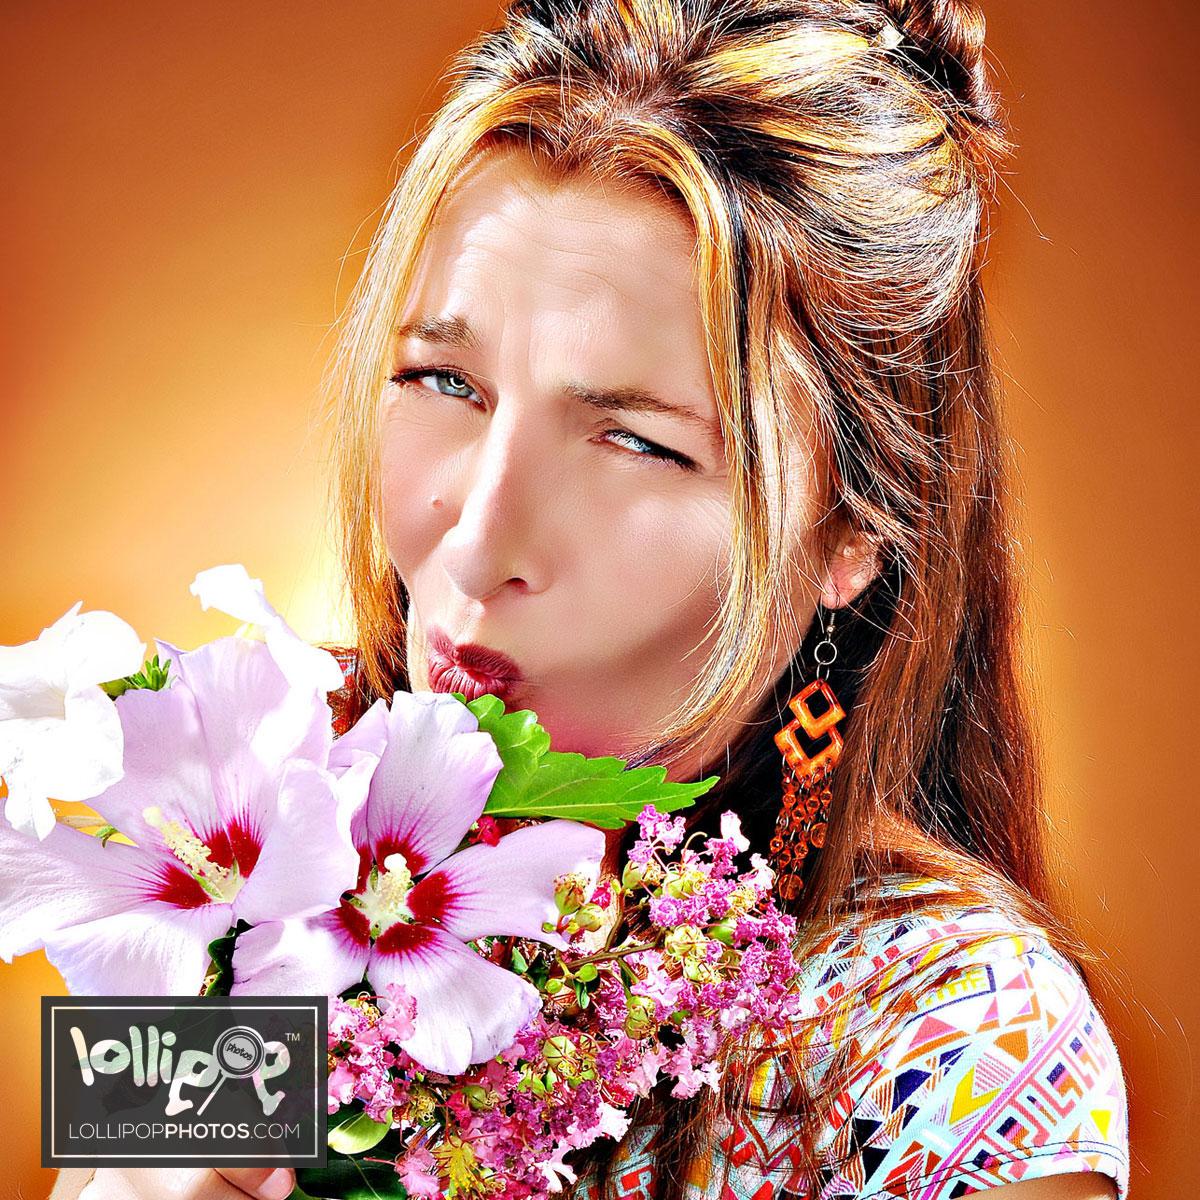 msdig-nora-canfield-lollipop-photos-568.jpg